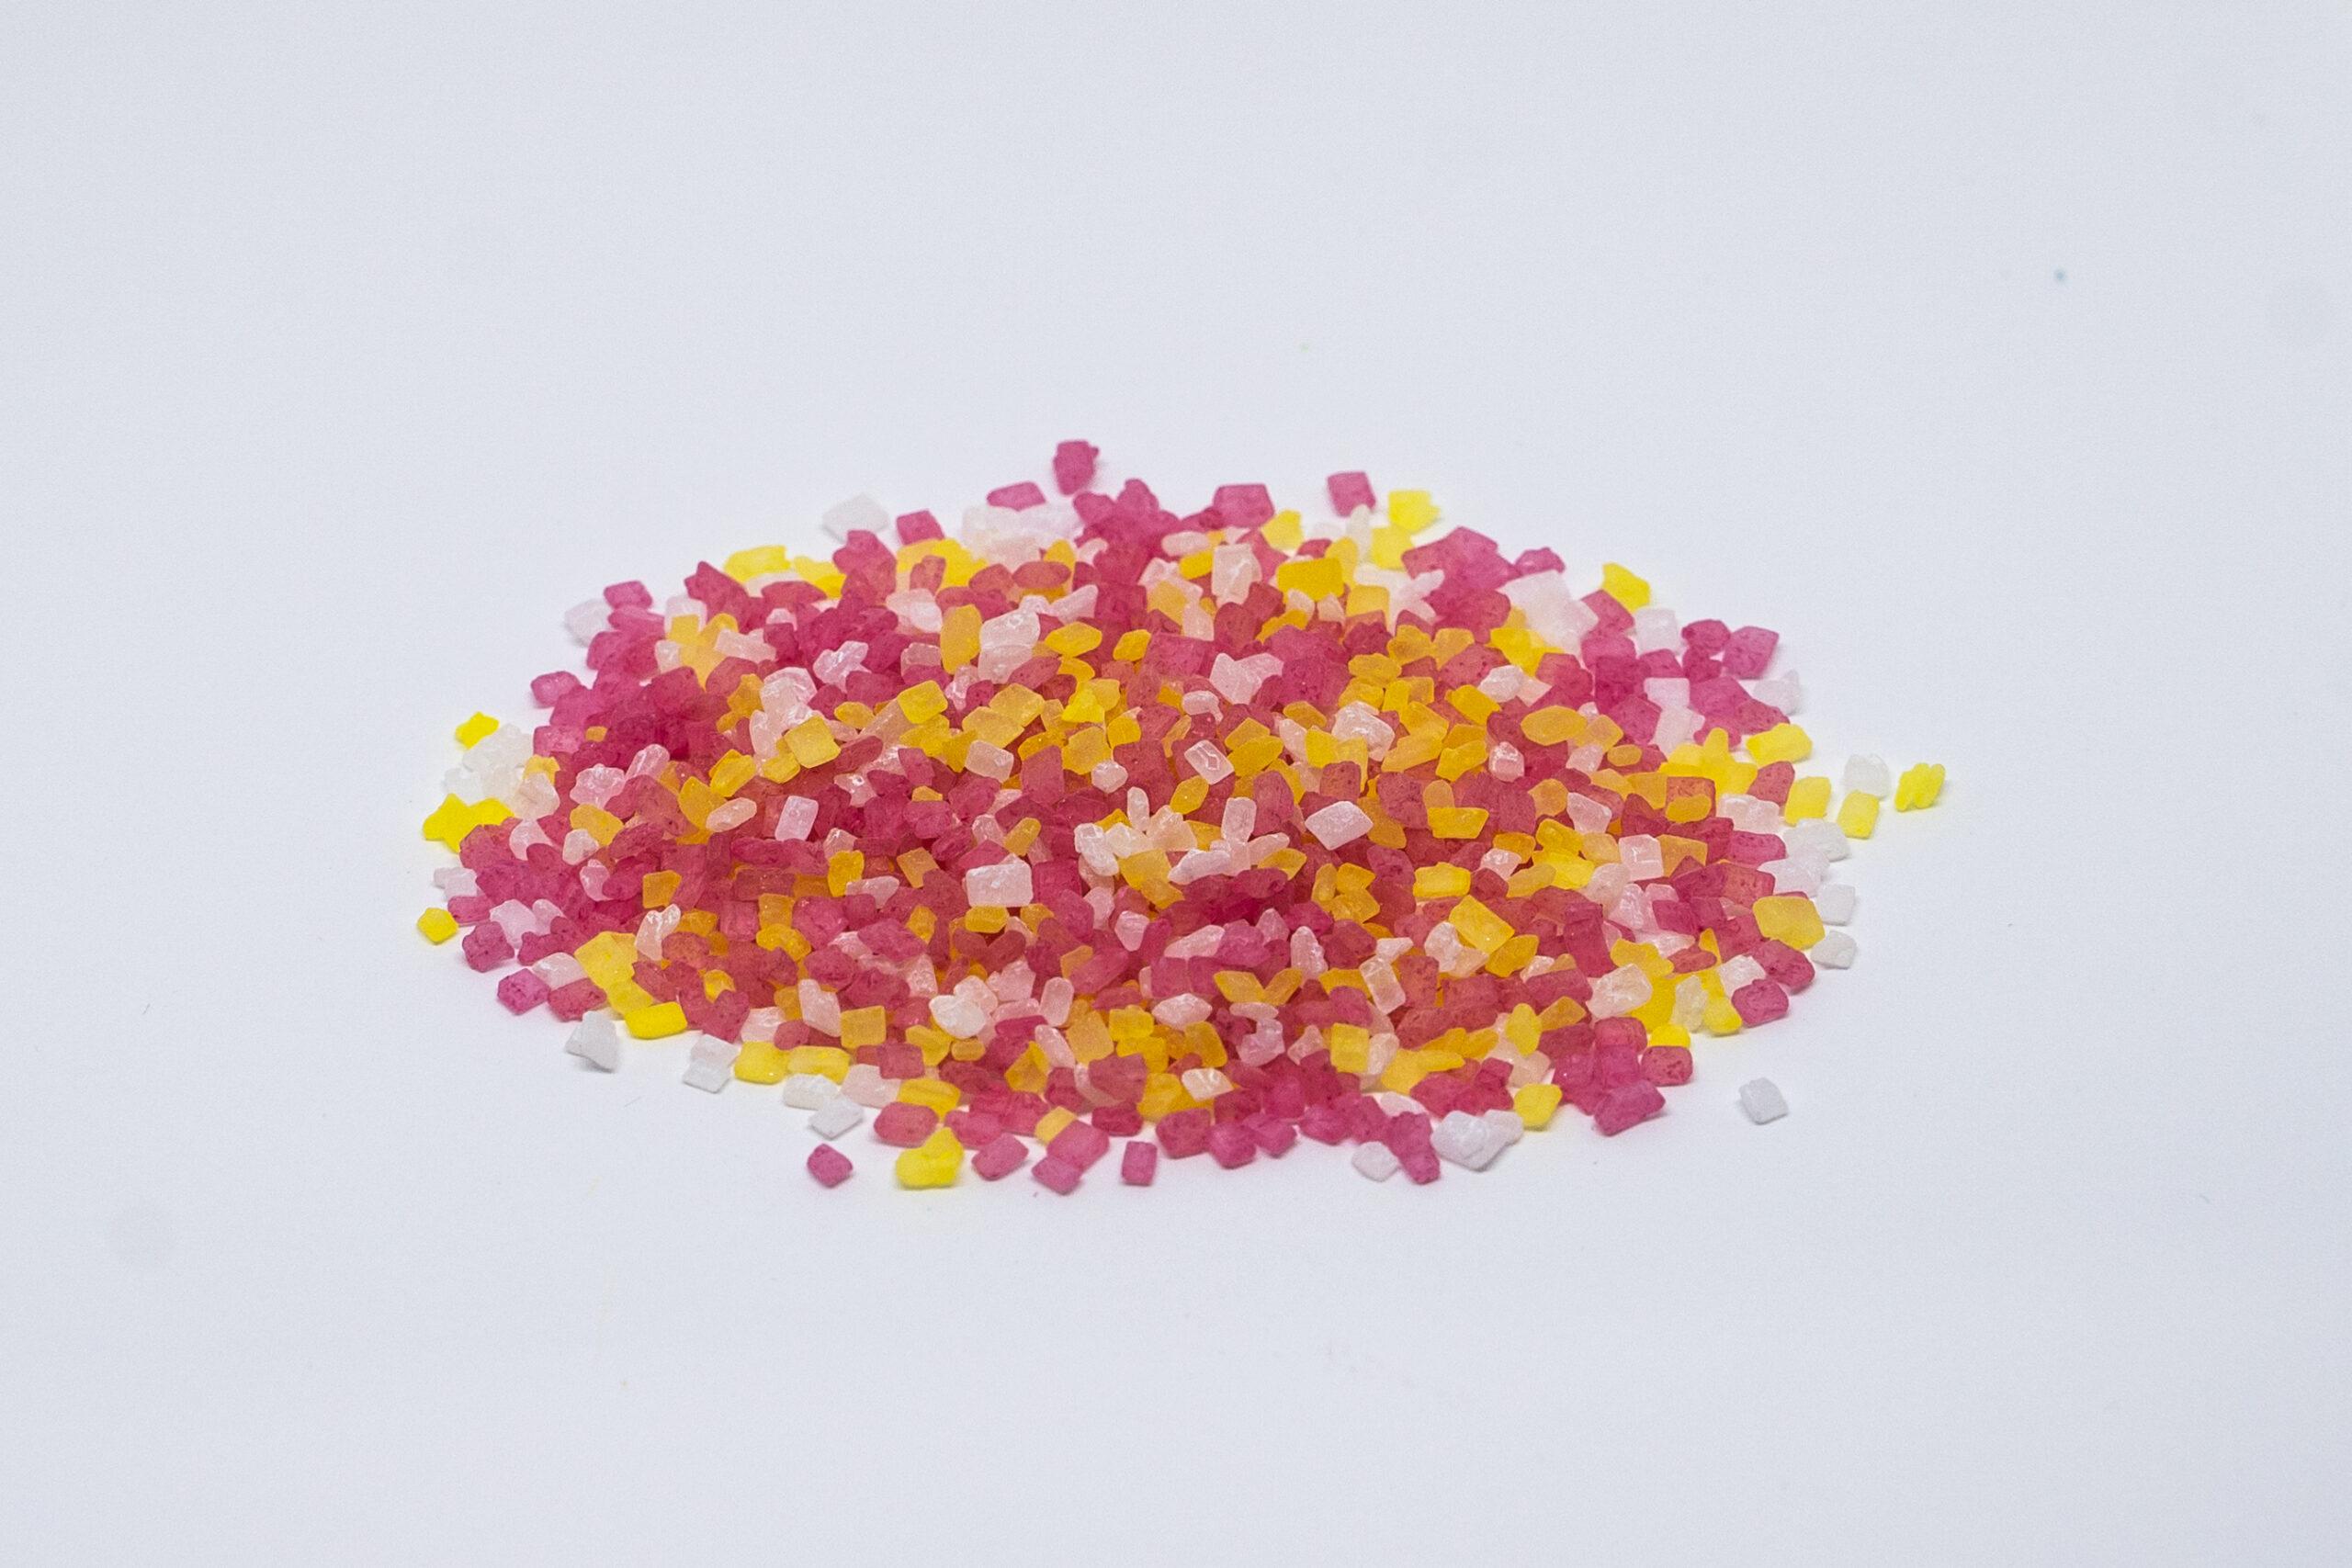 Pink, White and Yellow sugar mix